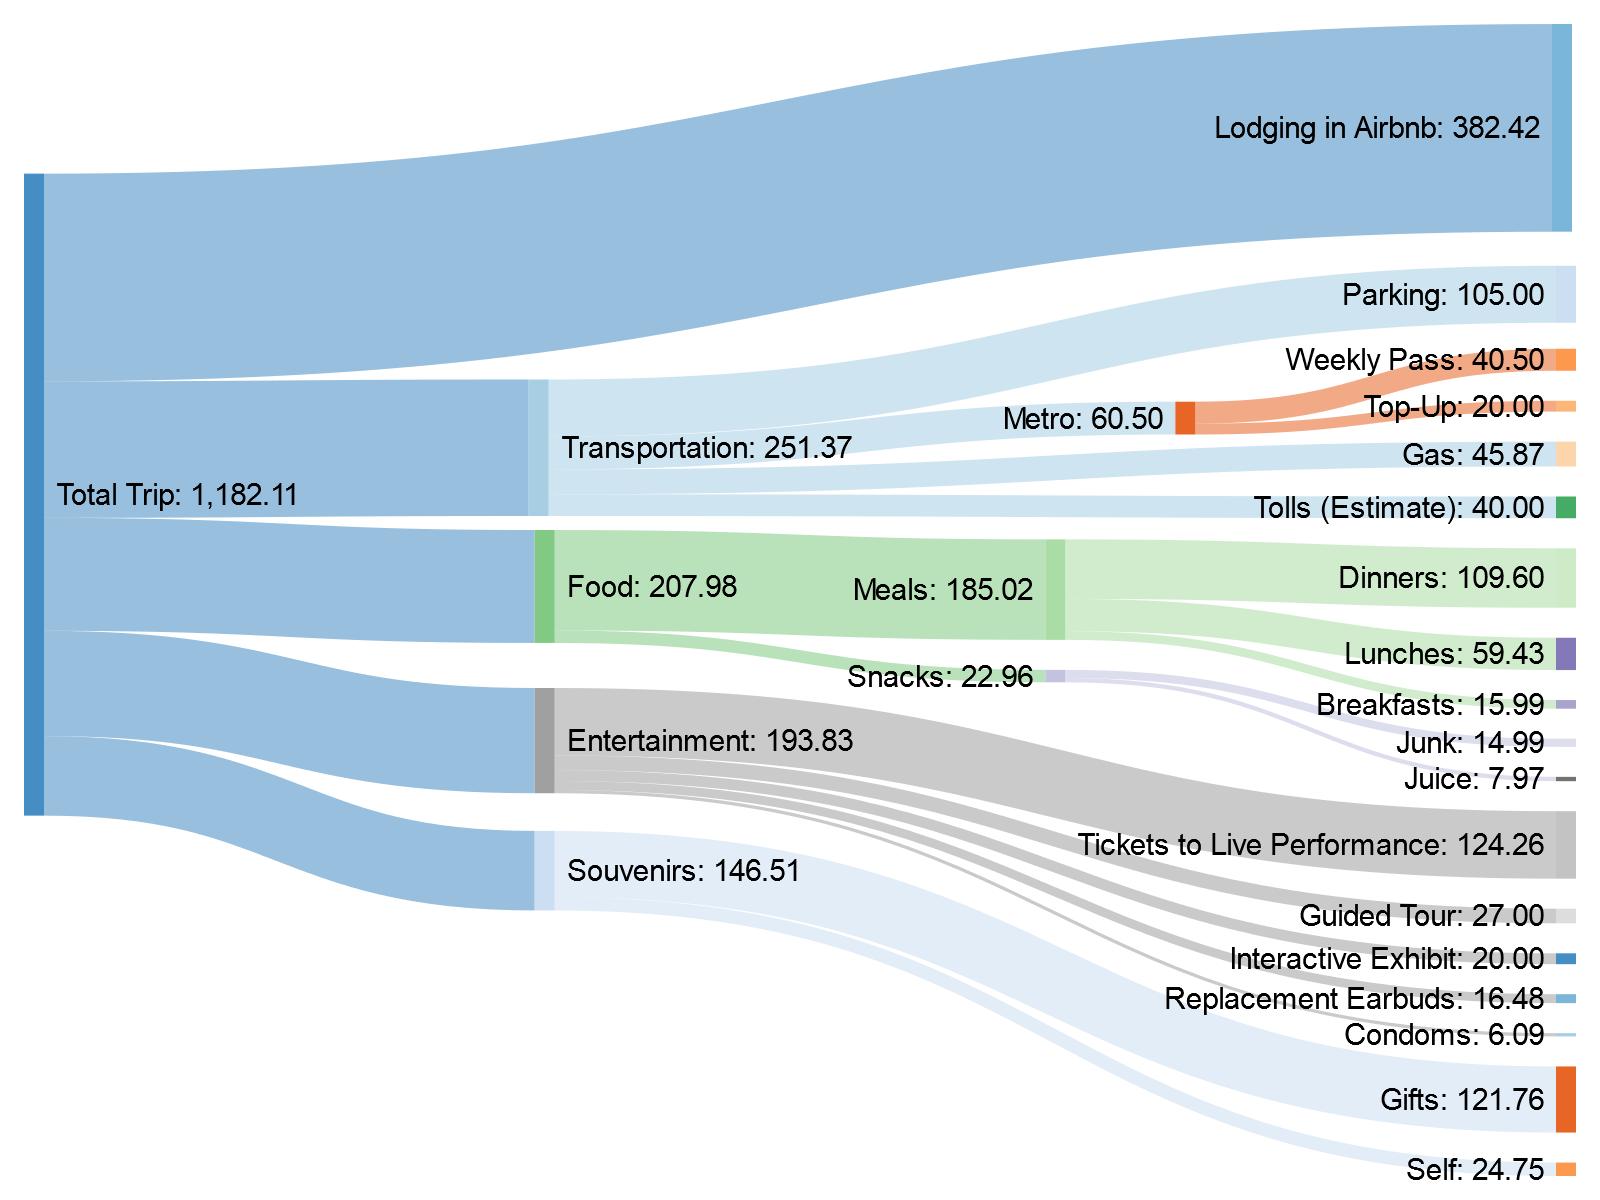 how to do a sankey diagram magic chef refrigerator parts of budget for my trip washington dc oc dataisbeautiful